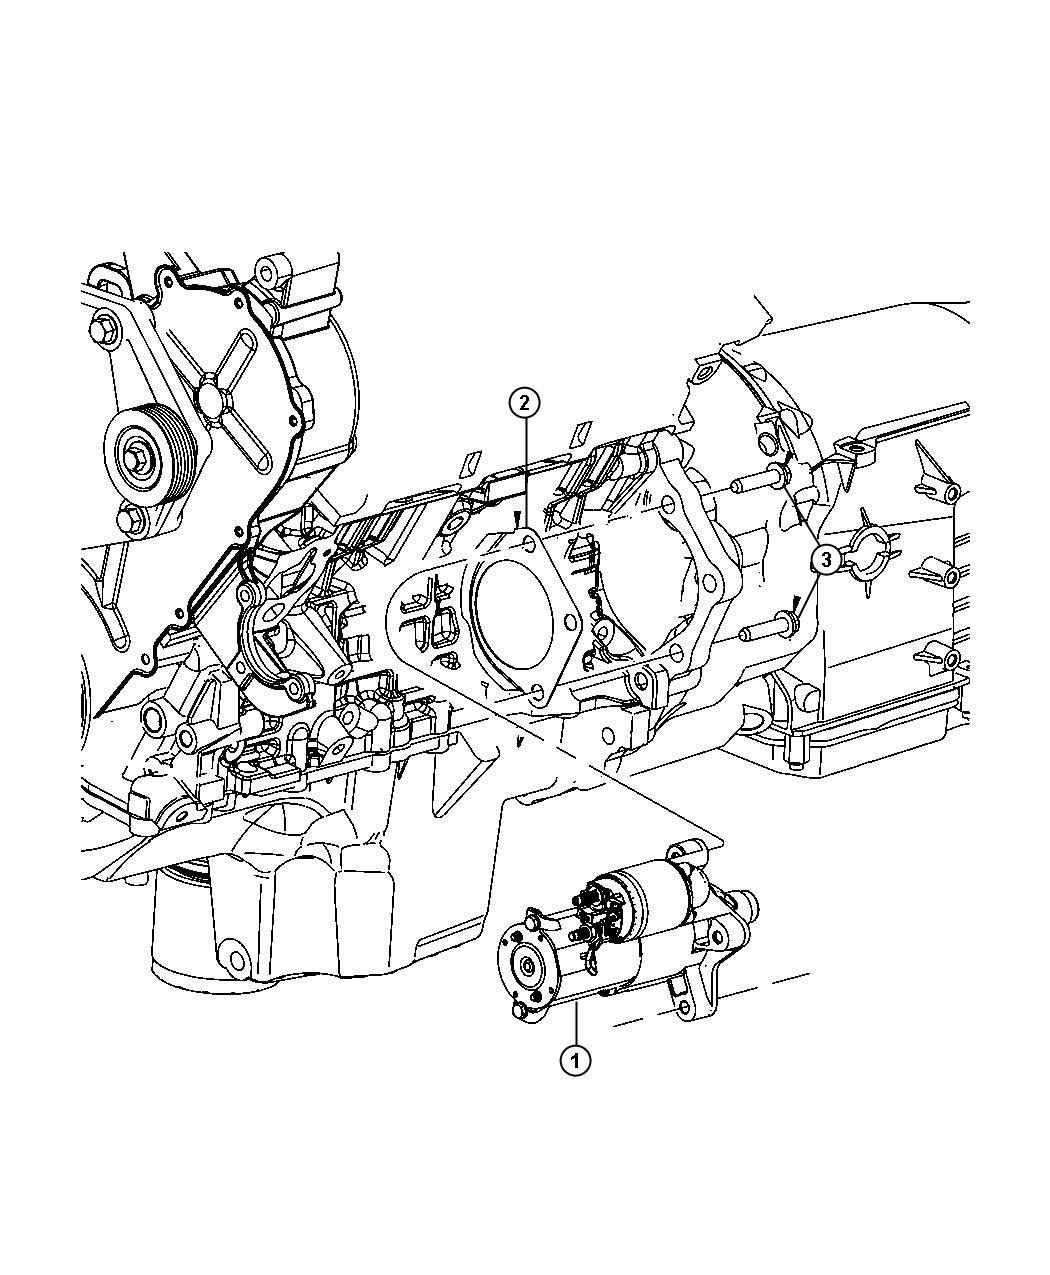 2009 Dodge Nitro Starter  Engine  Remanufactured  Starters